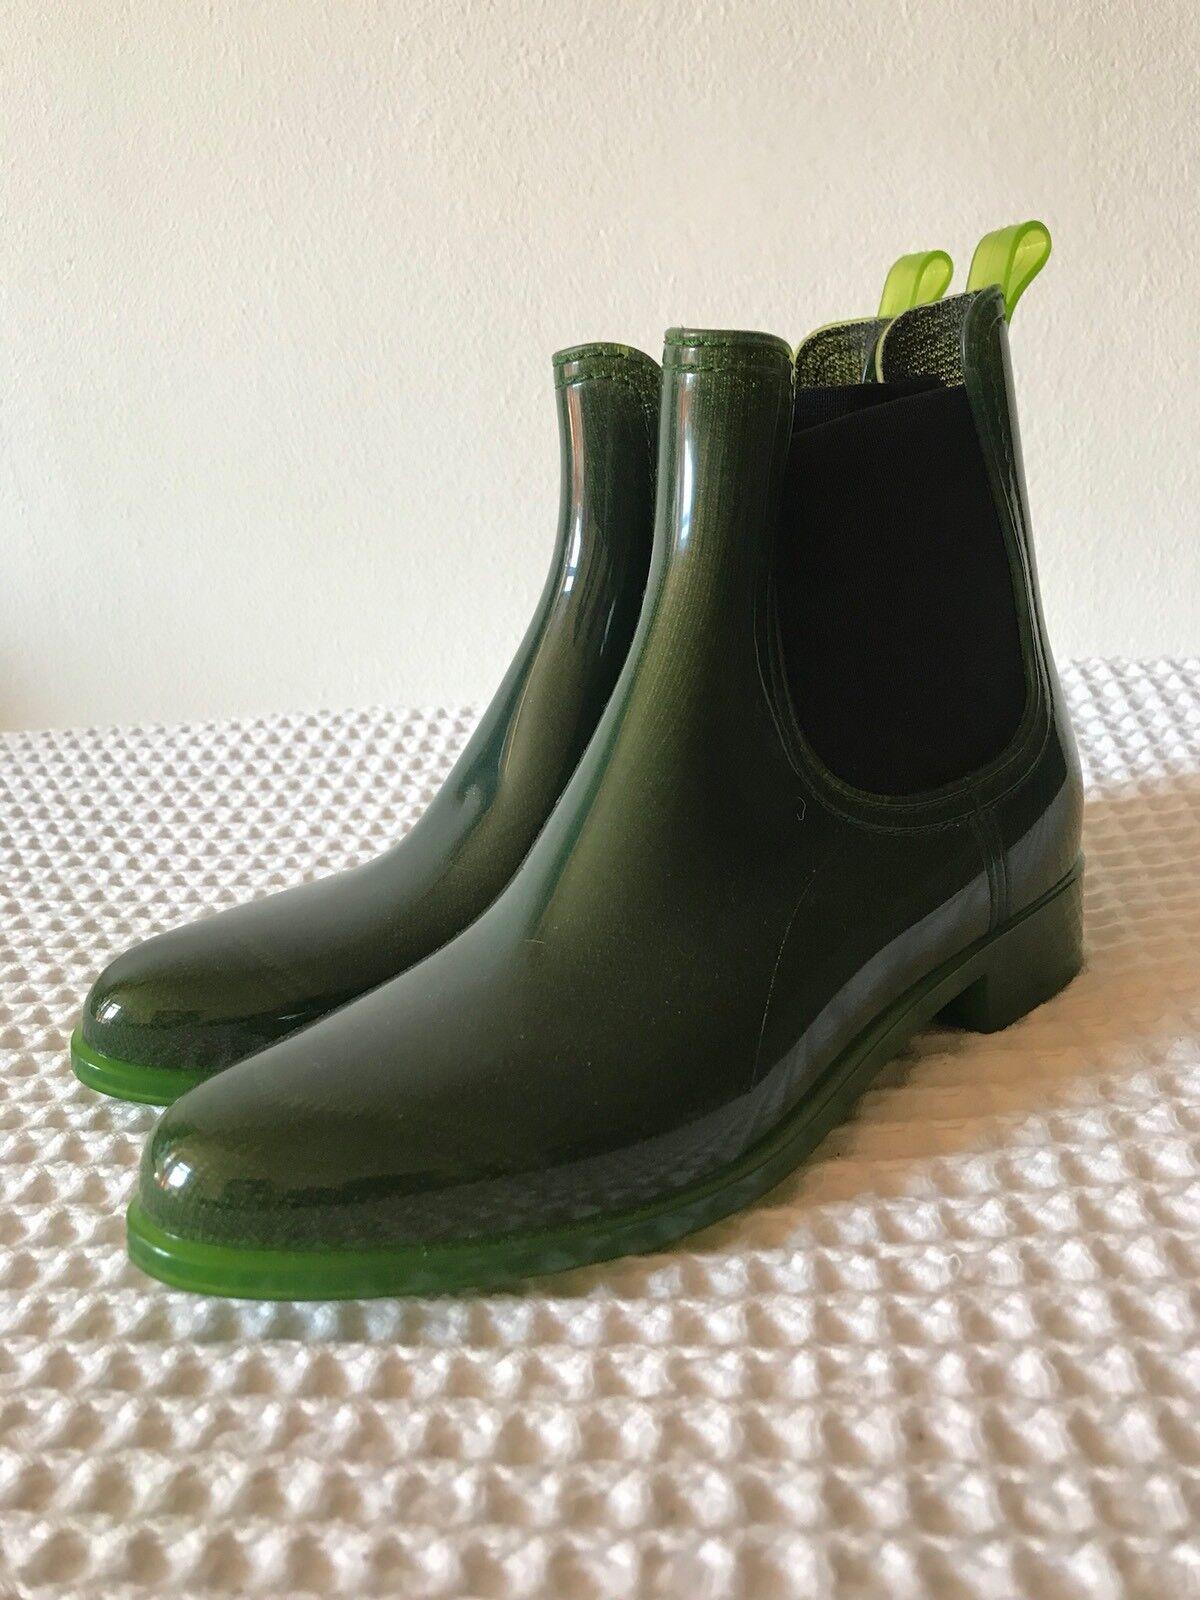 6b98bac139a JEFFERY CAMPBELL GREEN RUBBER CHELSEA Size 4 UK, 37 EU BOOTS ...